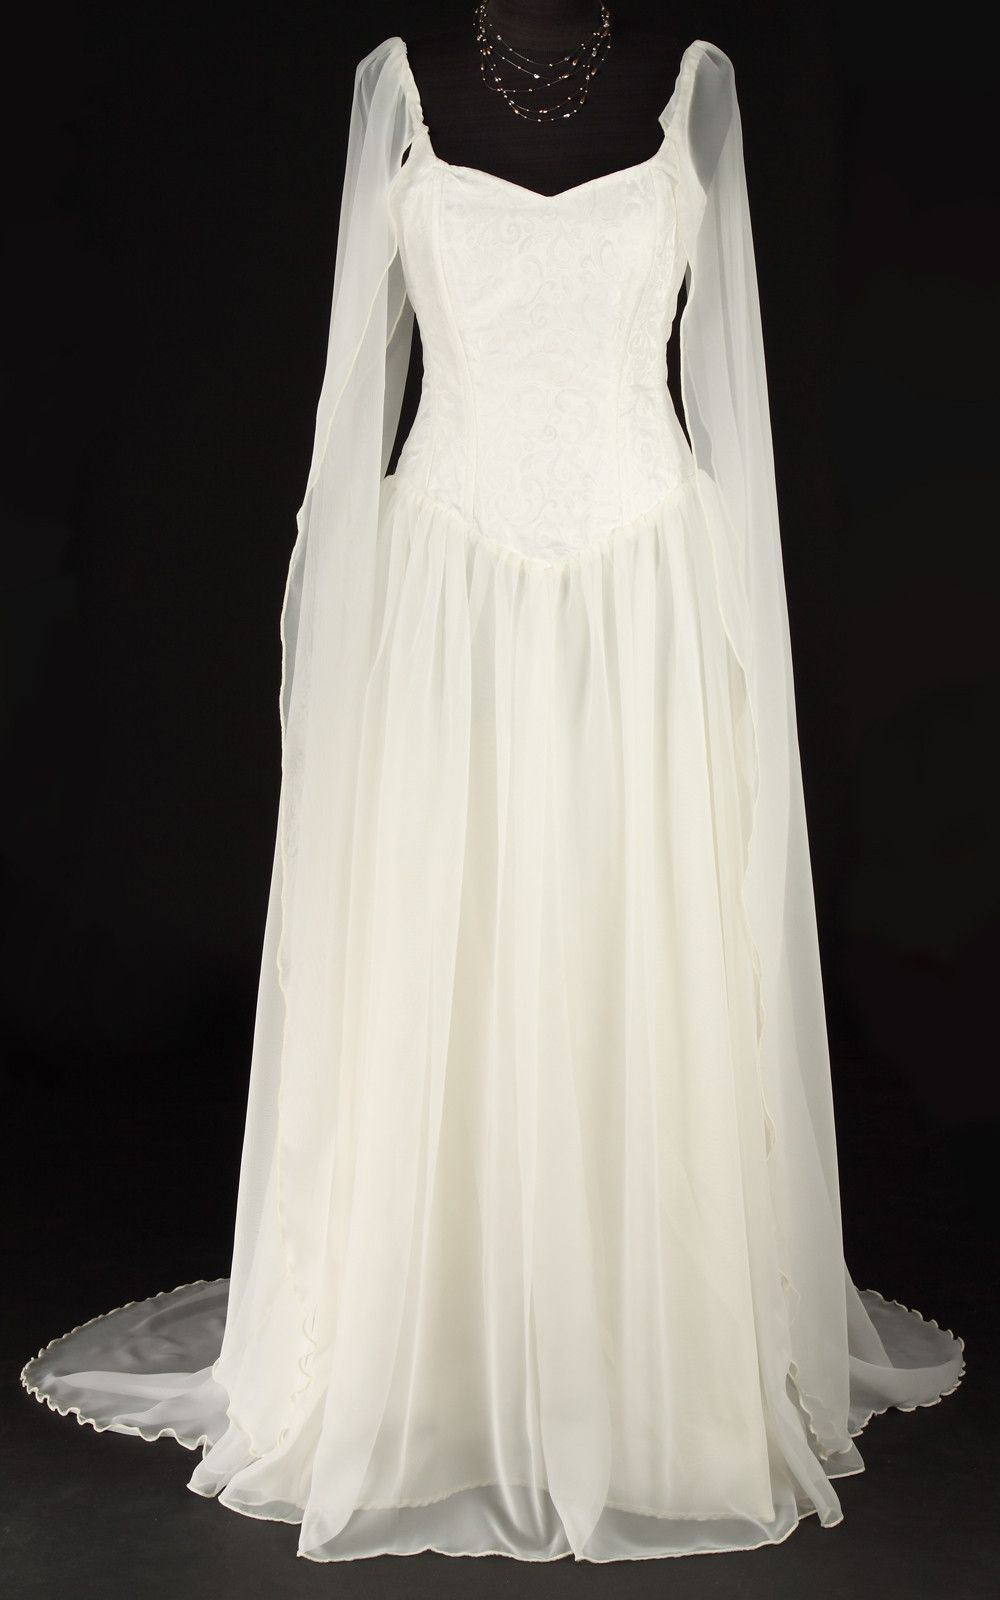 439IV - Ivory Avalon Dress | Pinterest | Gowns, Wedding and Wedding ...